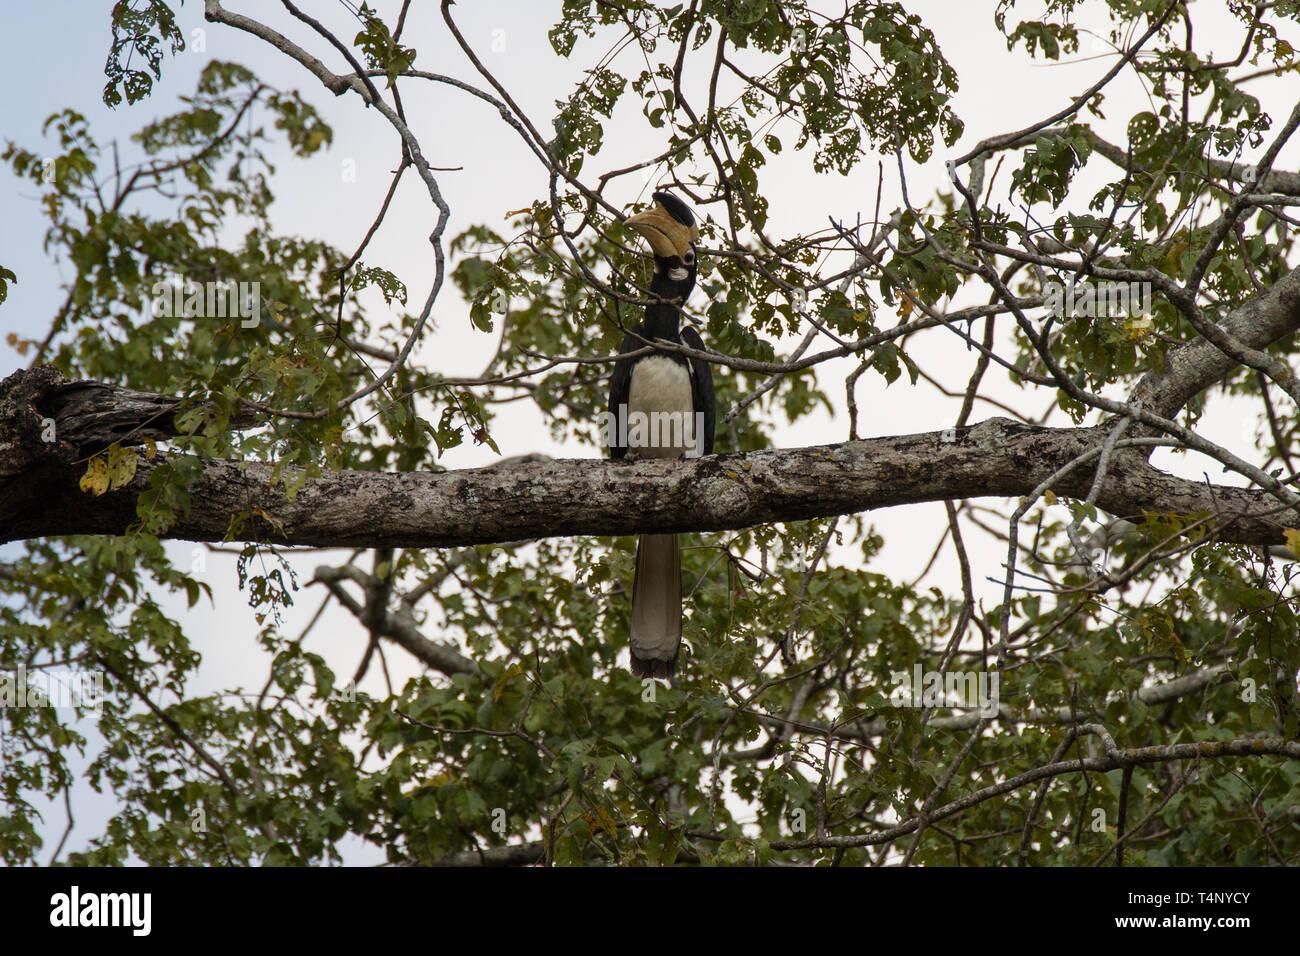 Malabar Pied Hornbill, Anthracoceros coronatus, A near threatened species. Sri Lanka - Stock Image